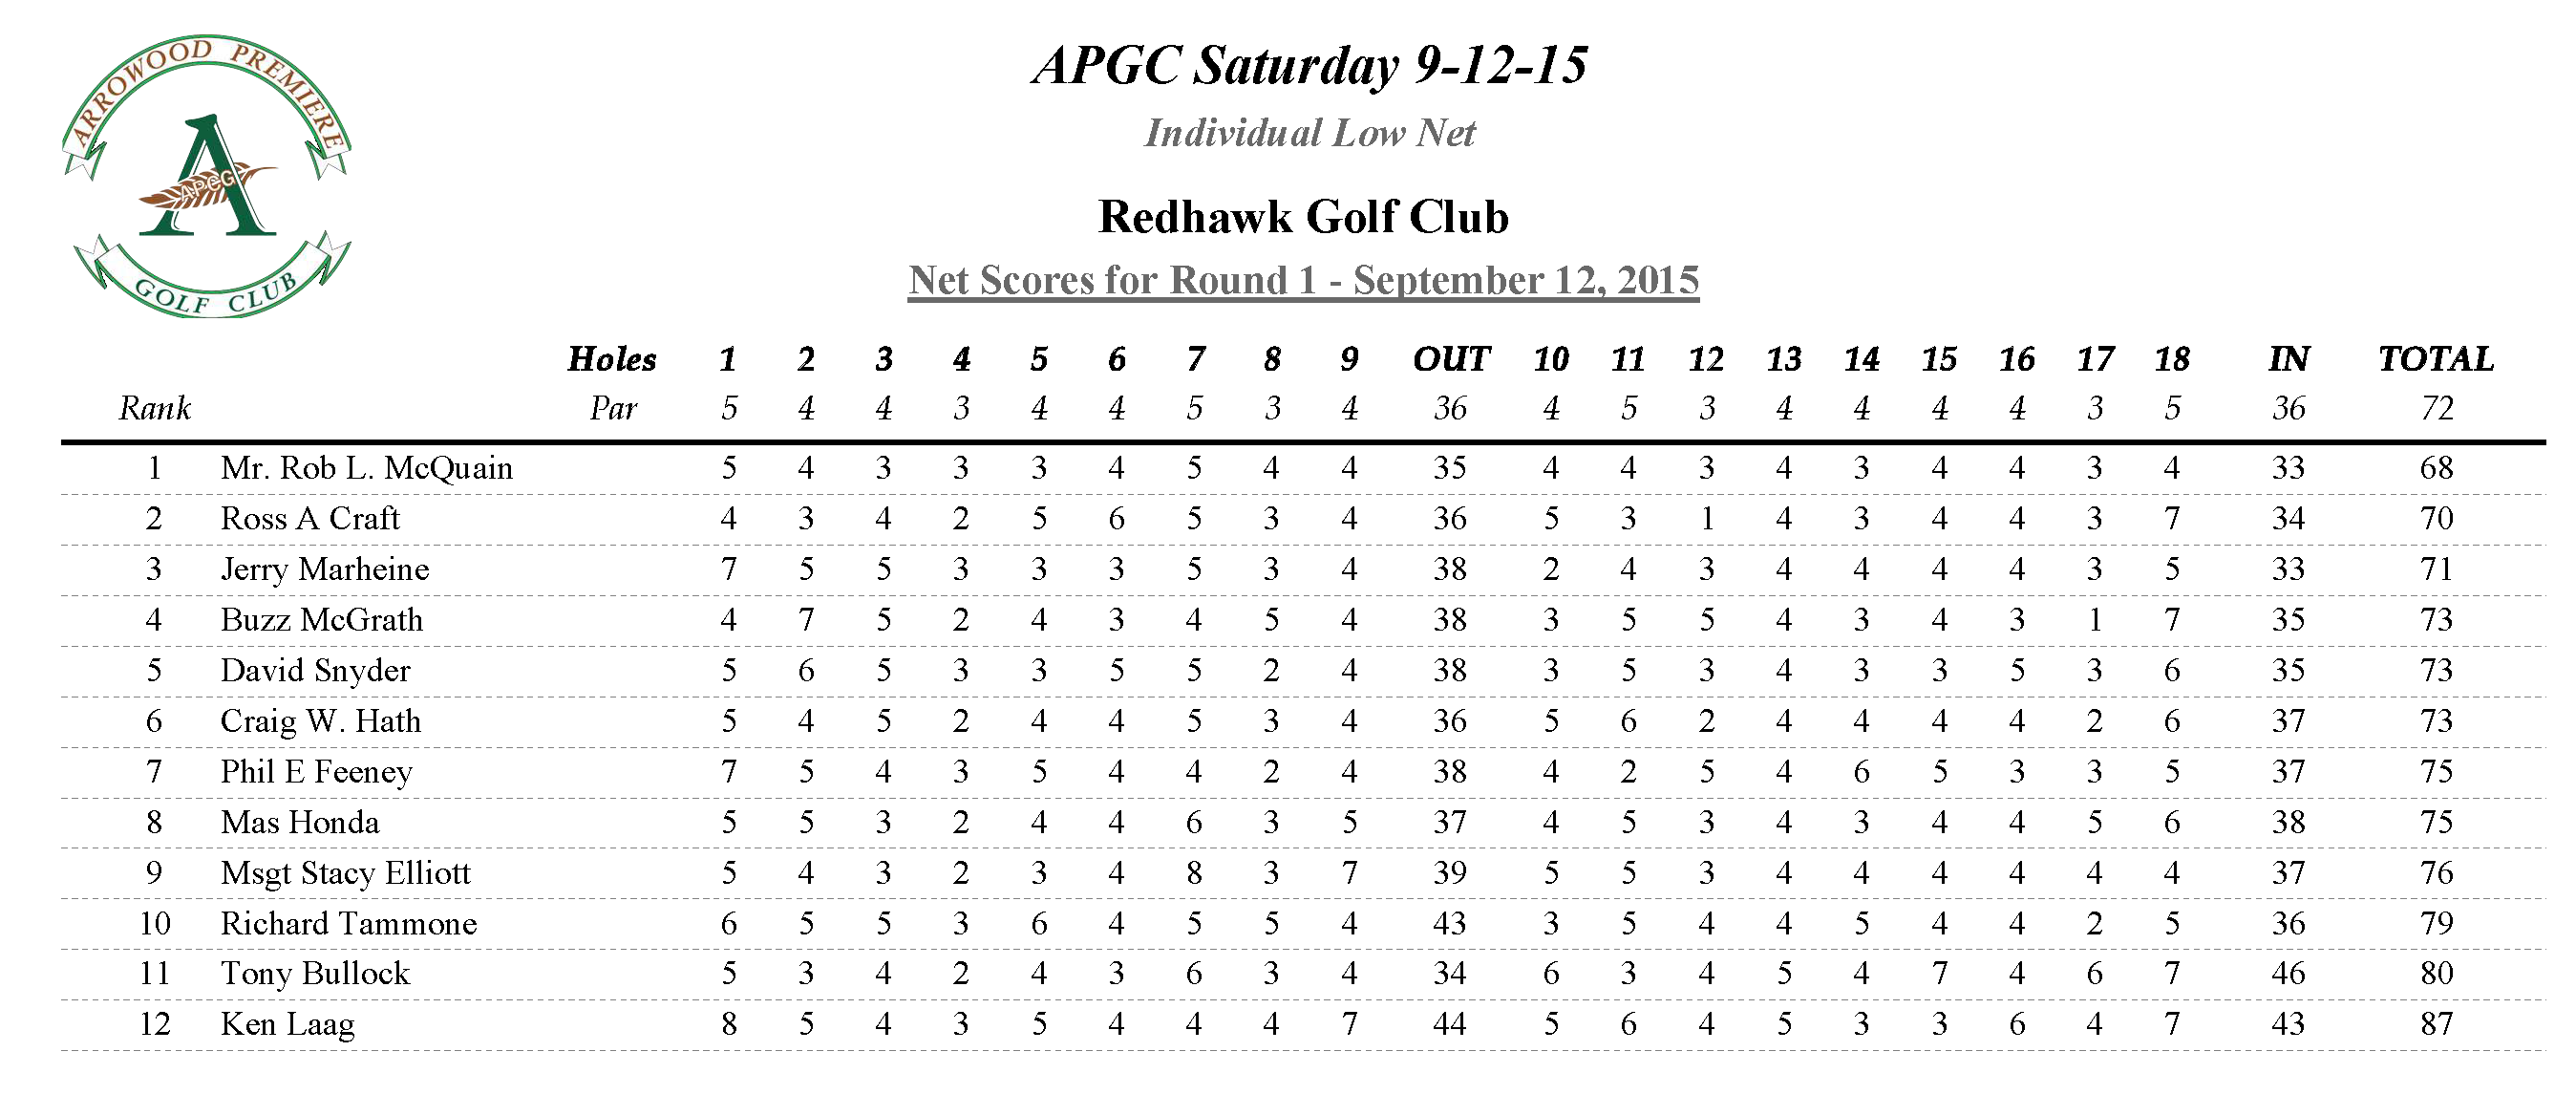 APGC Saturday 9-12-15